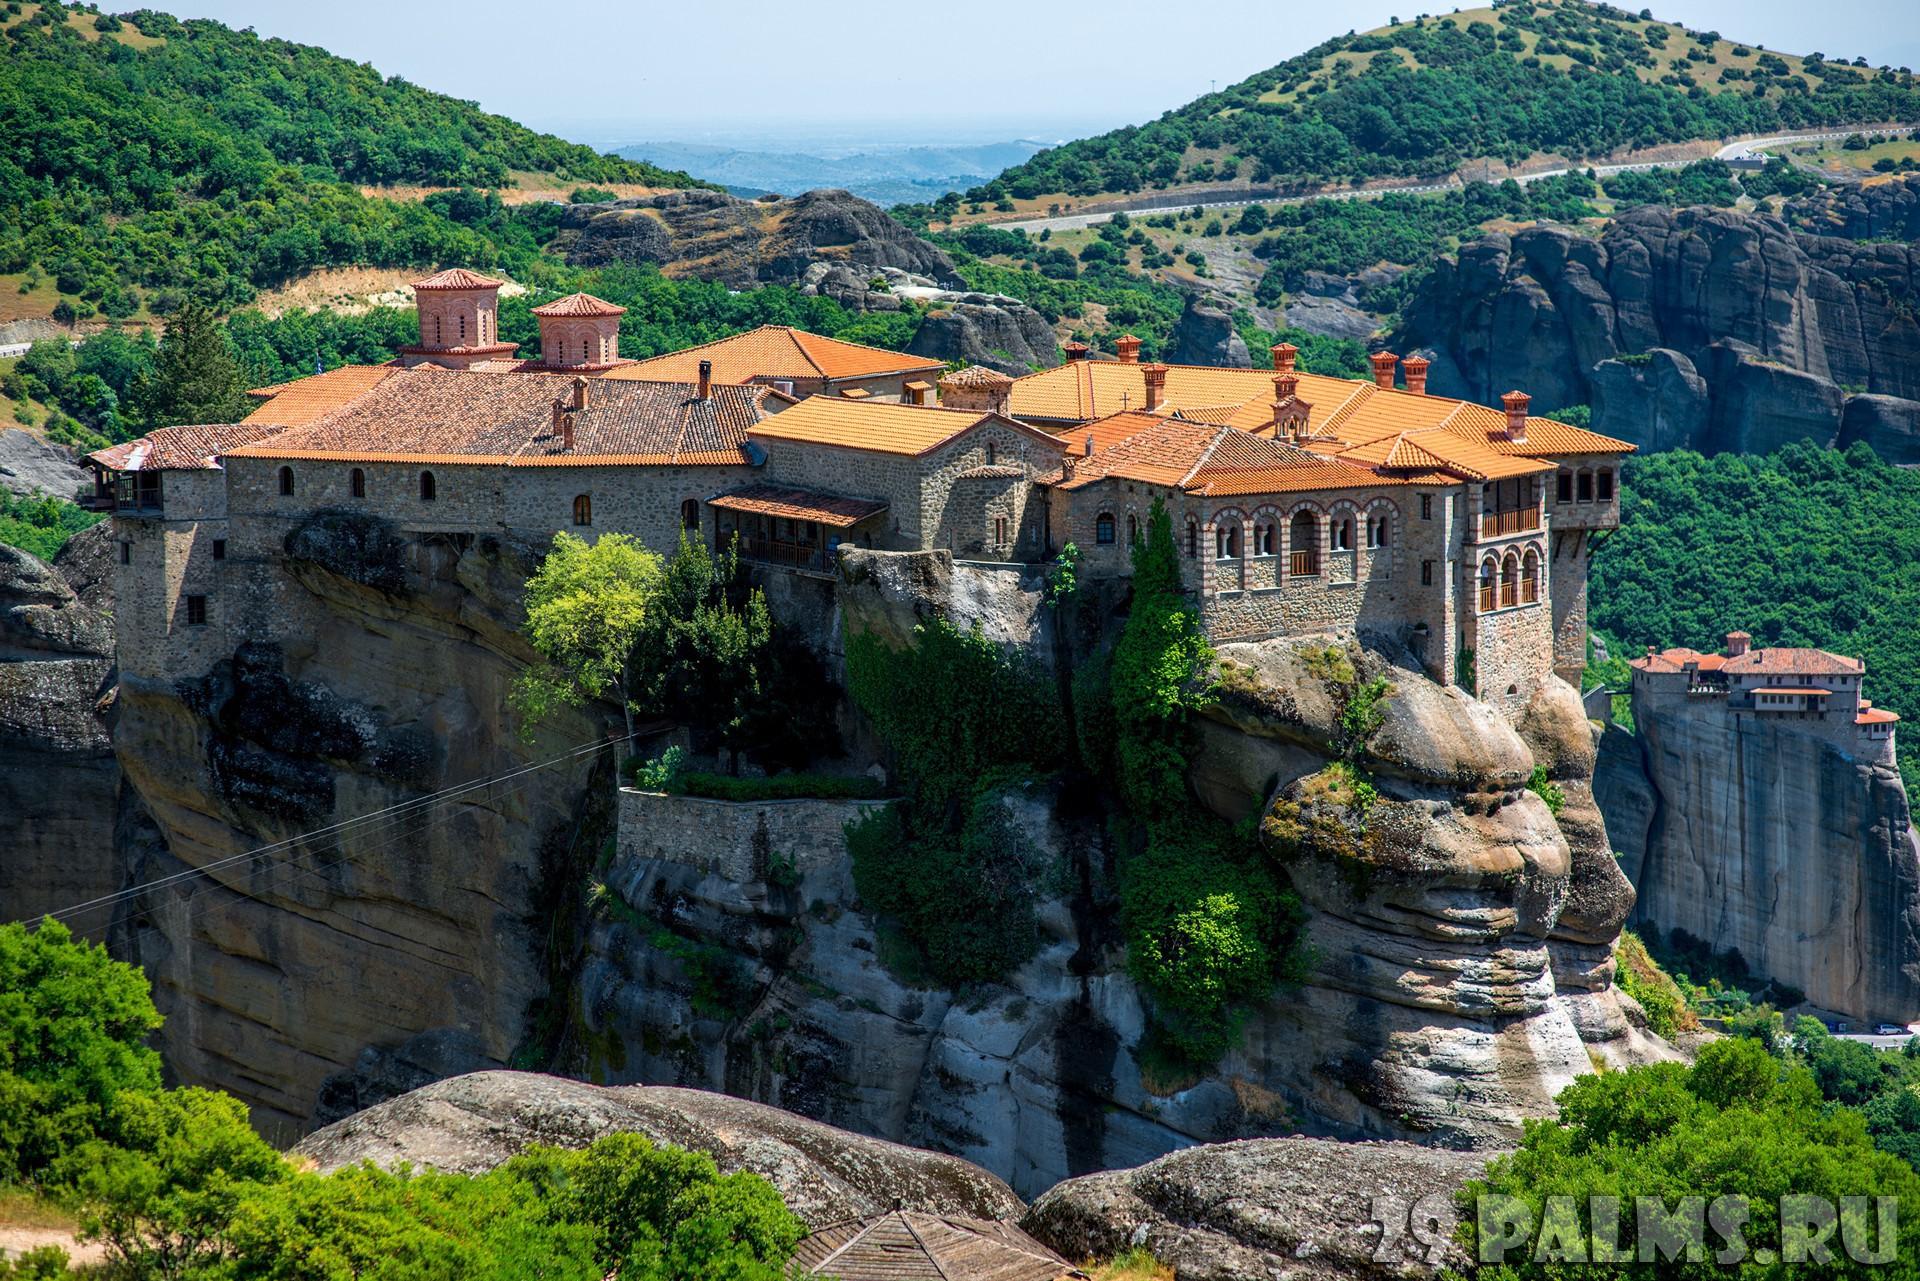 Varlaam Monastery, Meteora, Greece скачать